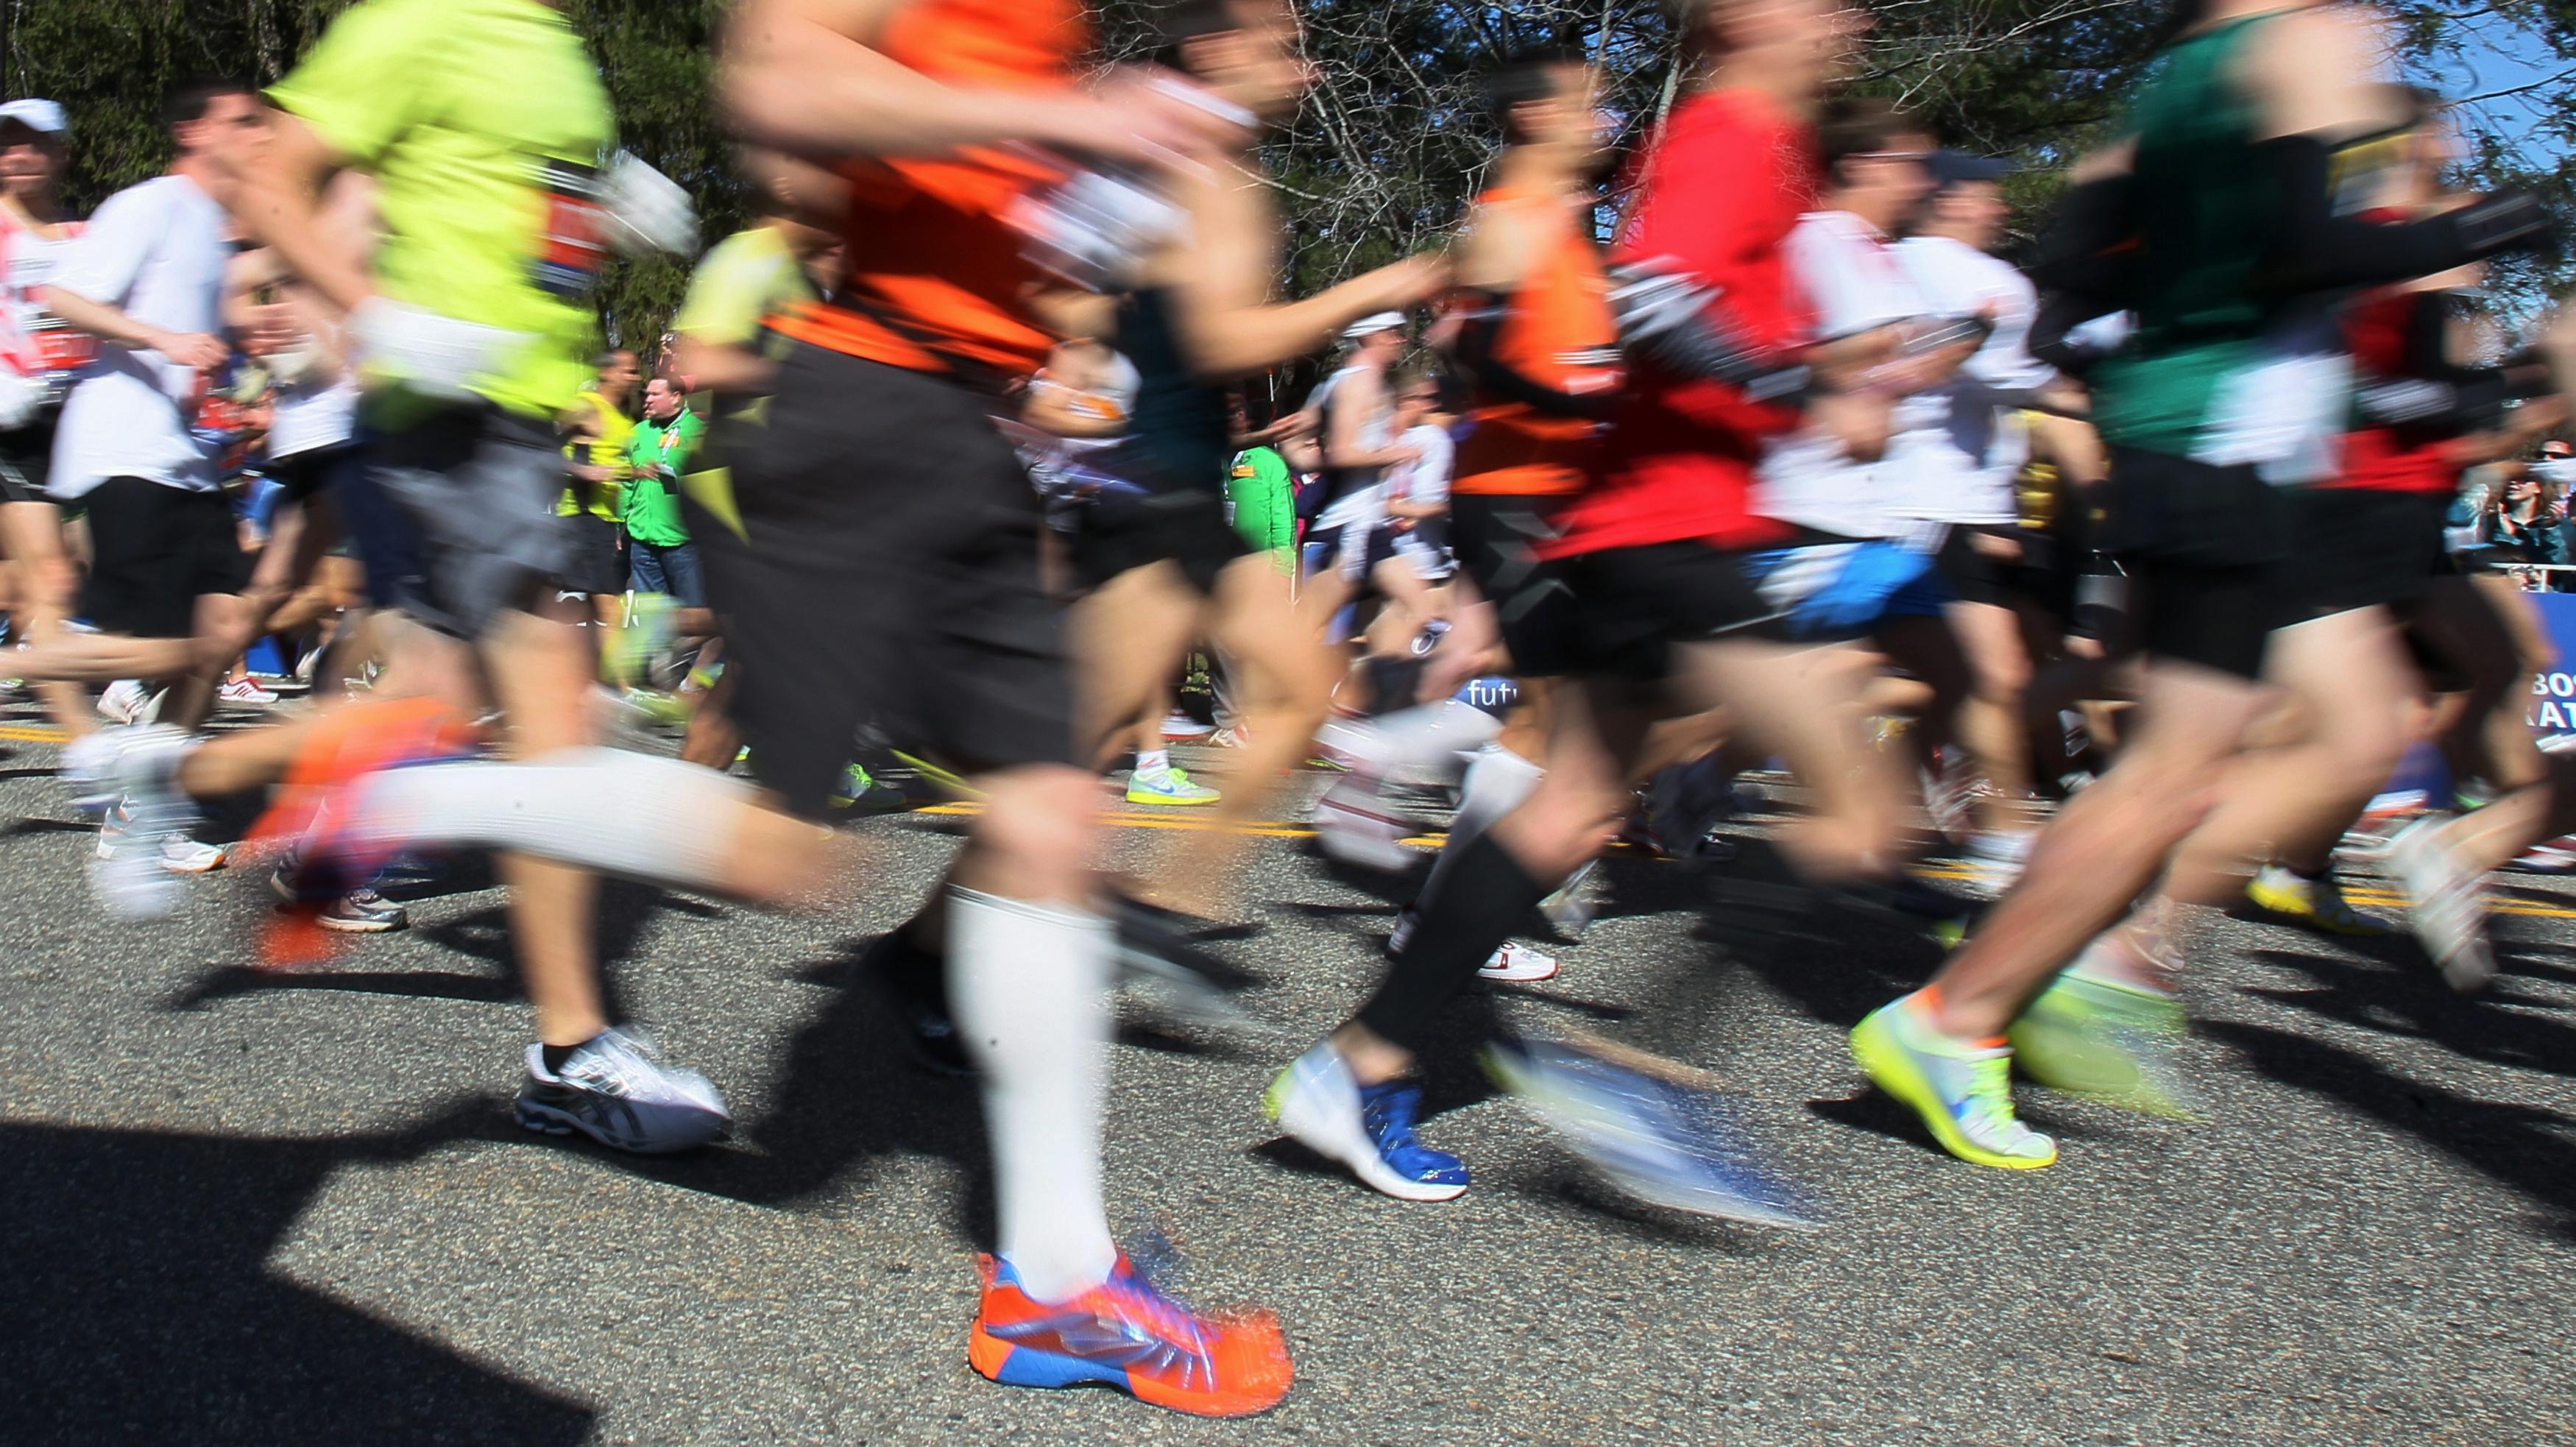 Marathon Training Lowers Heart Disease Risk In Middle-Aged Men